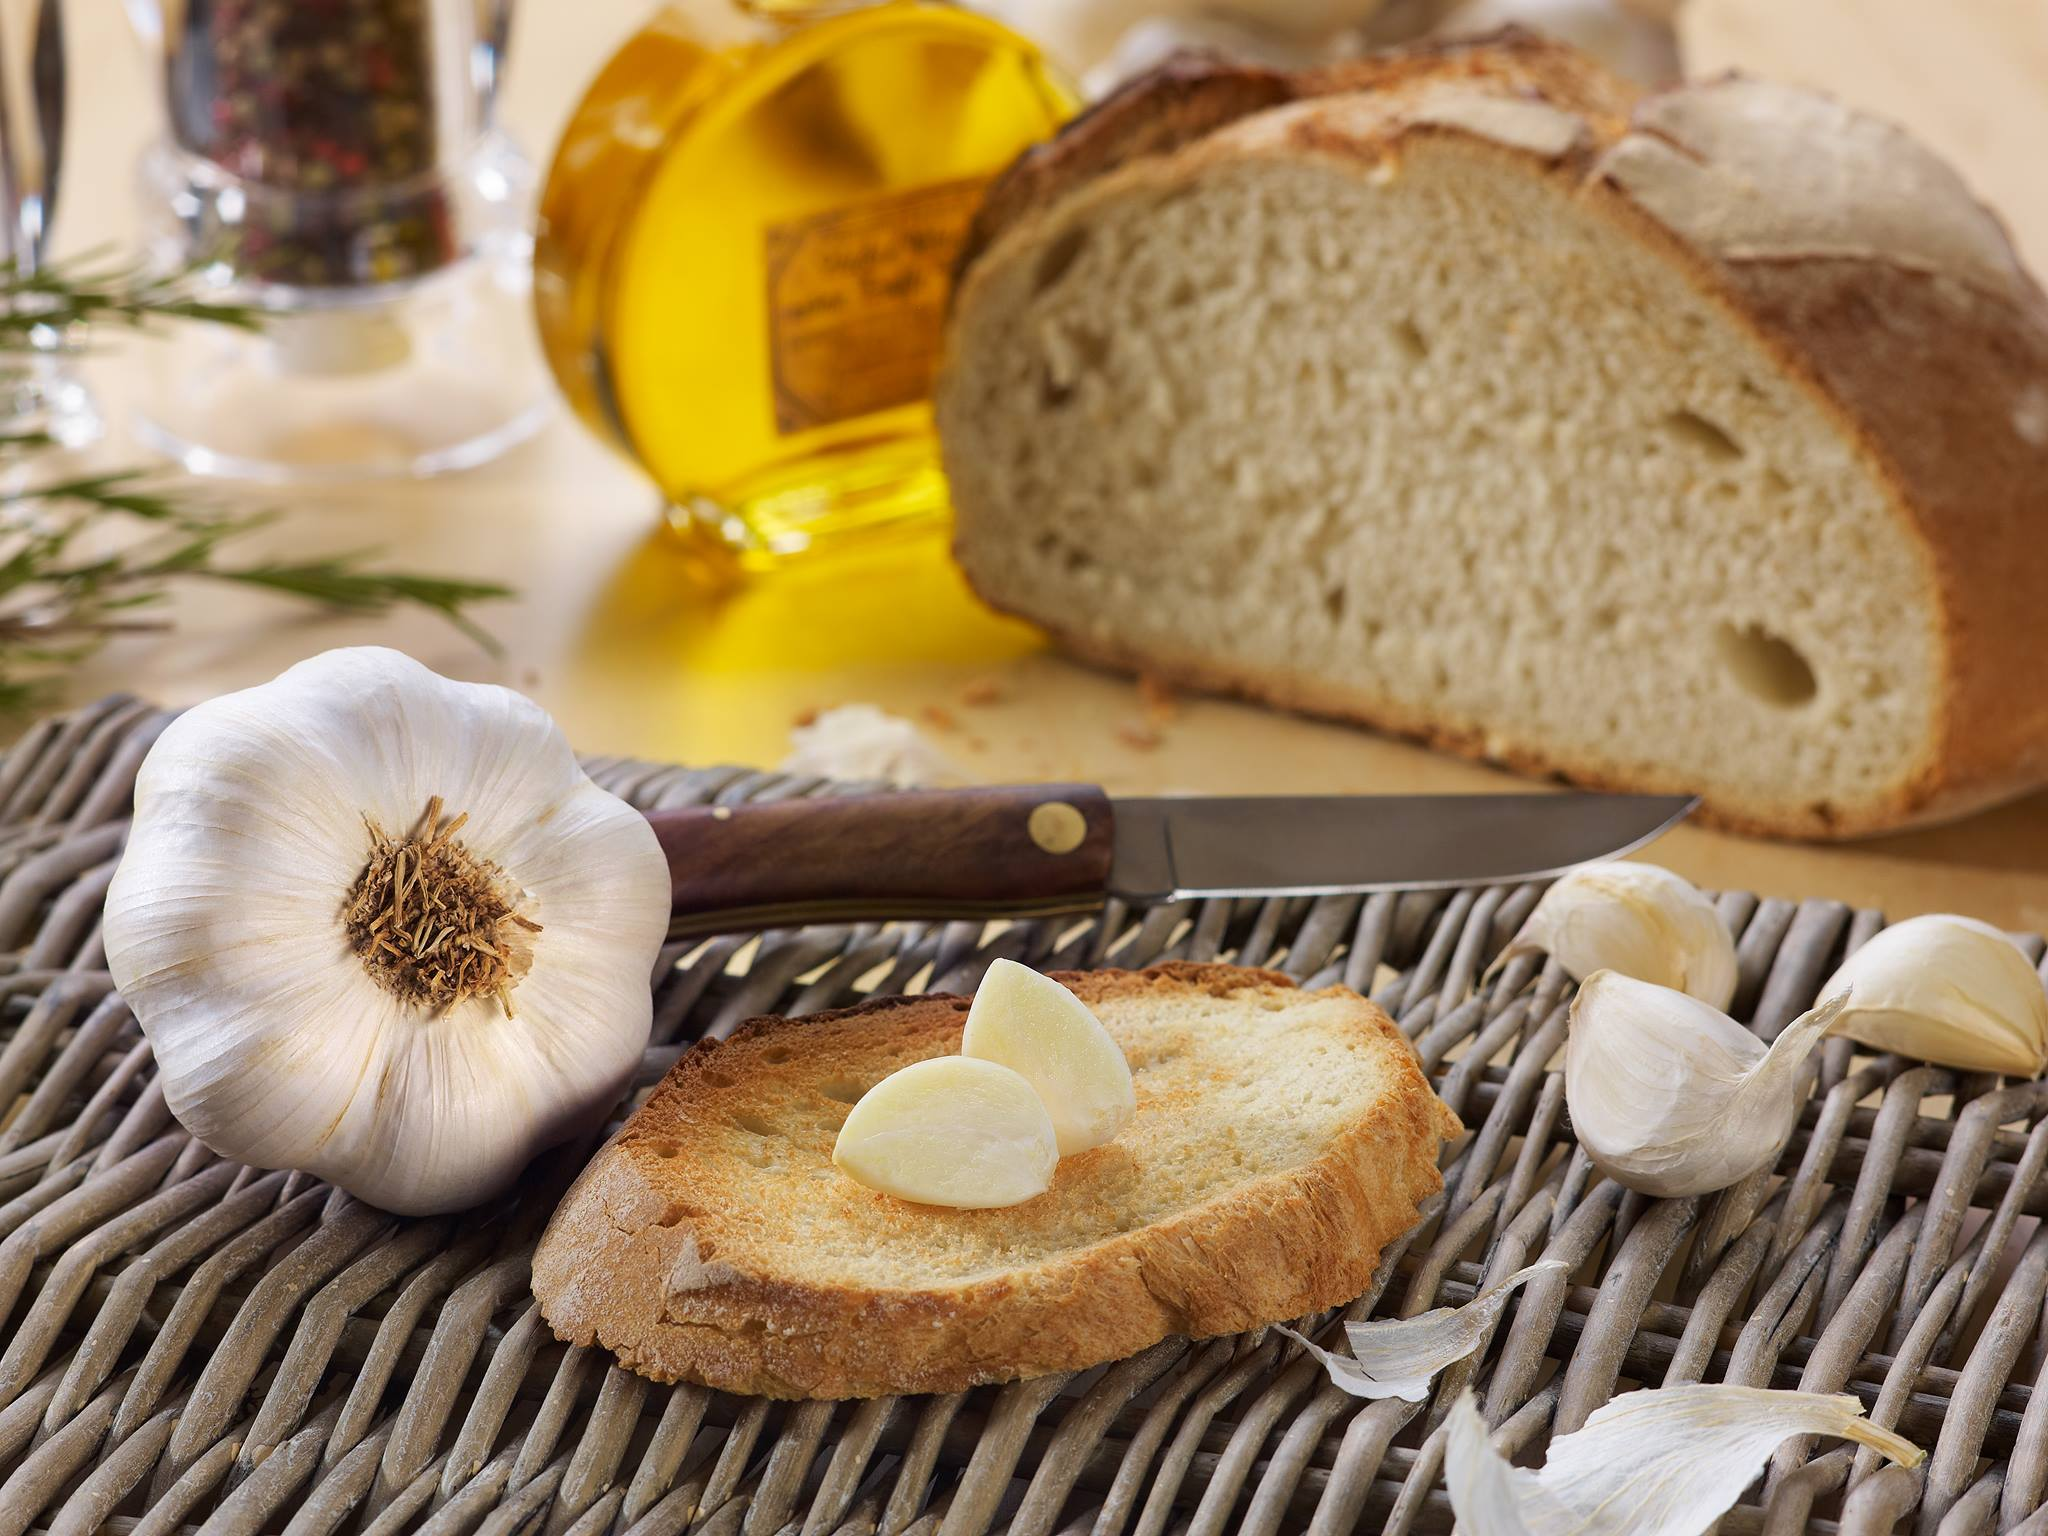 pain aillé en Lomagne Tarn et Garonnaise